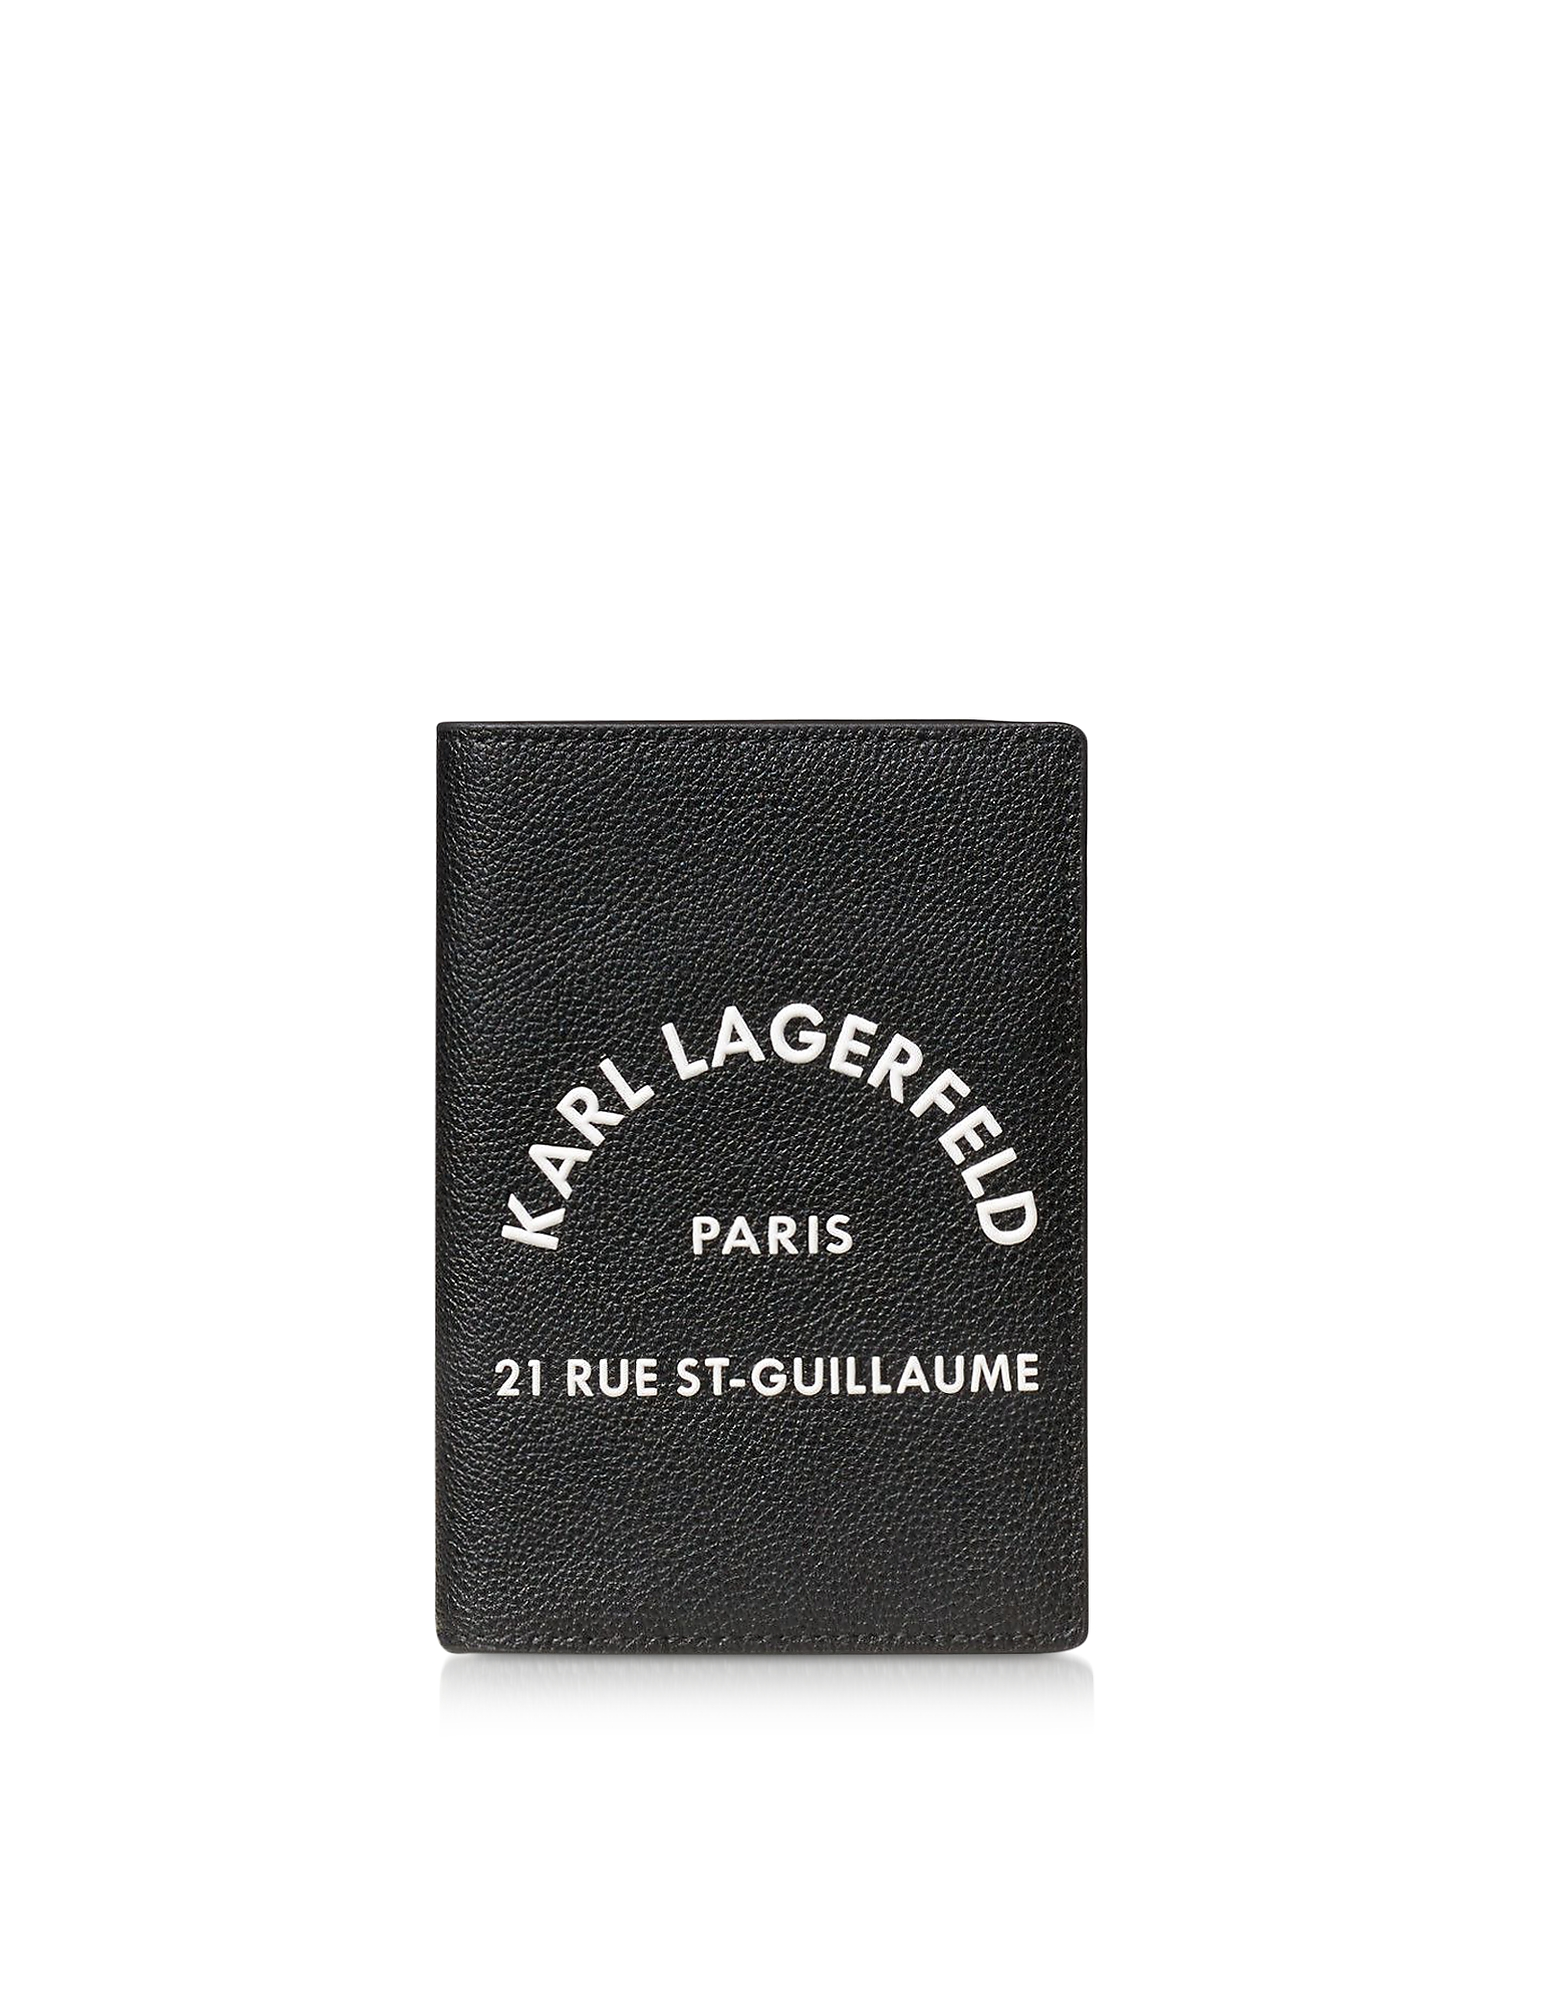 Rue St. Guillaume - Обложка для Паспорта Karl Lagerfeld